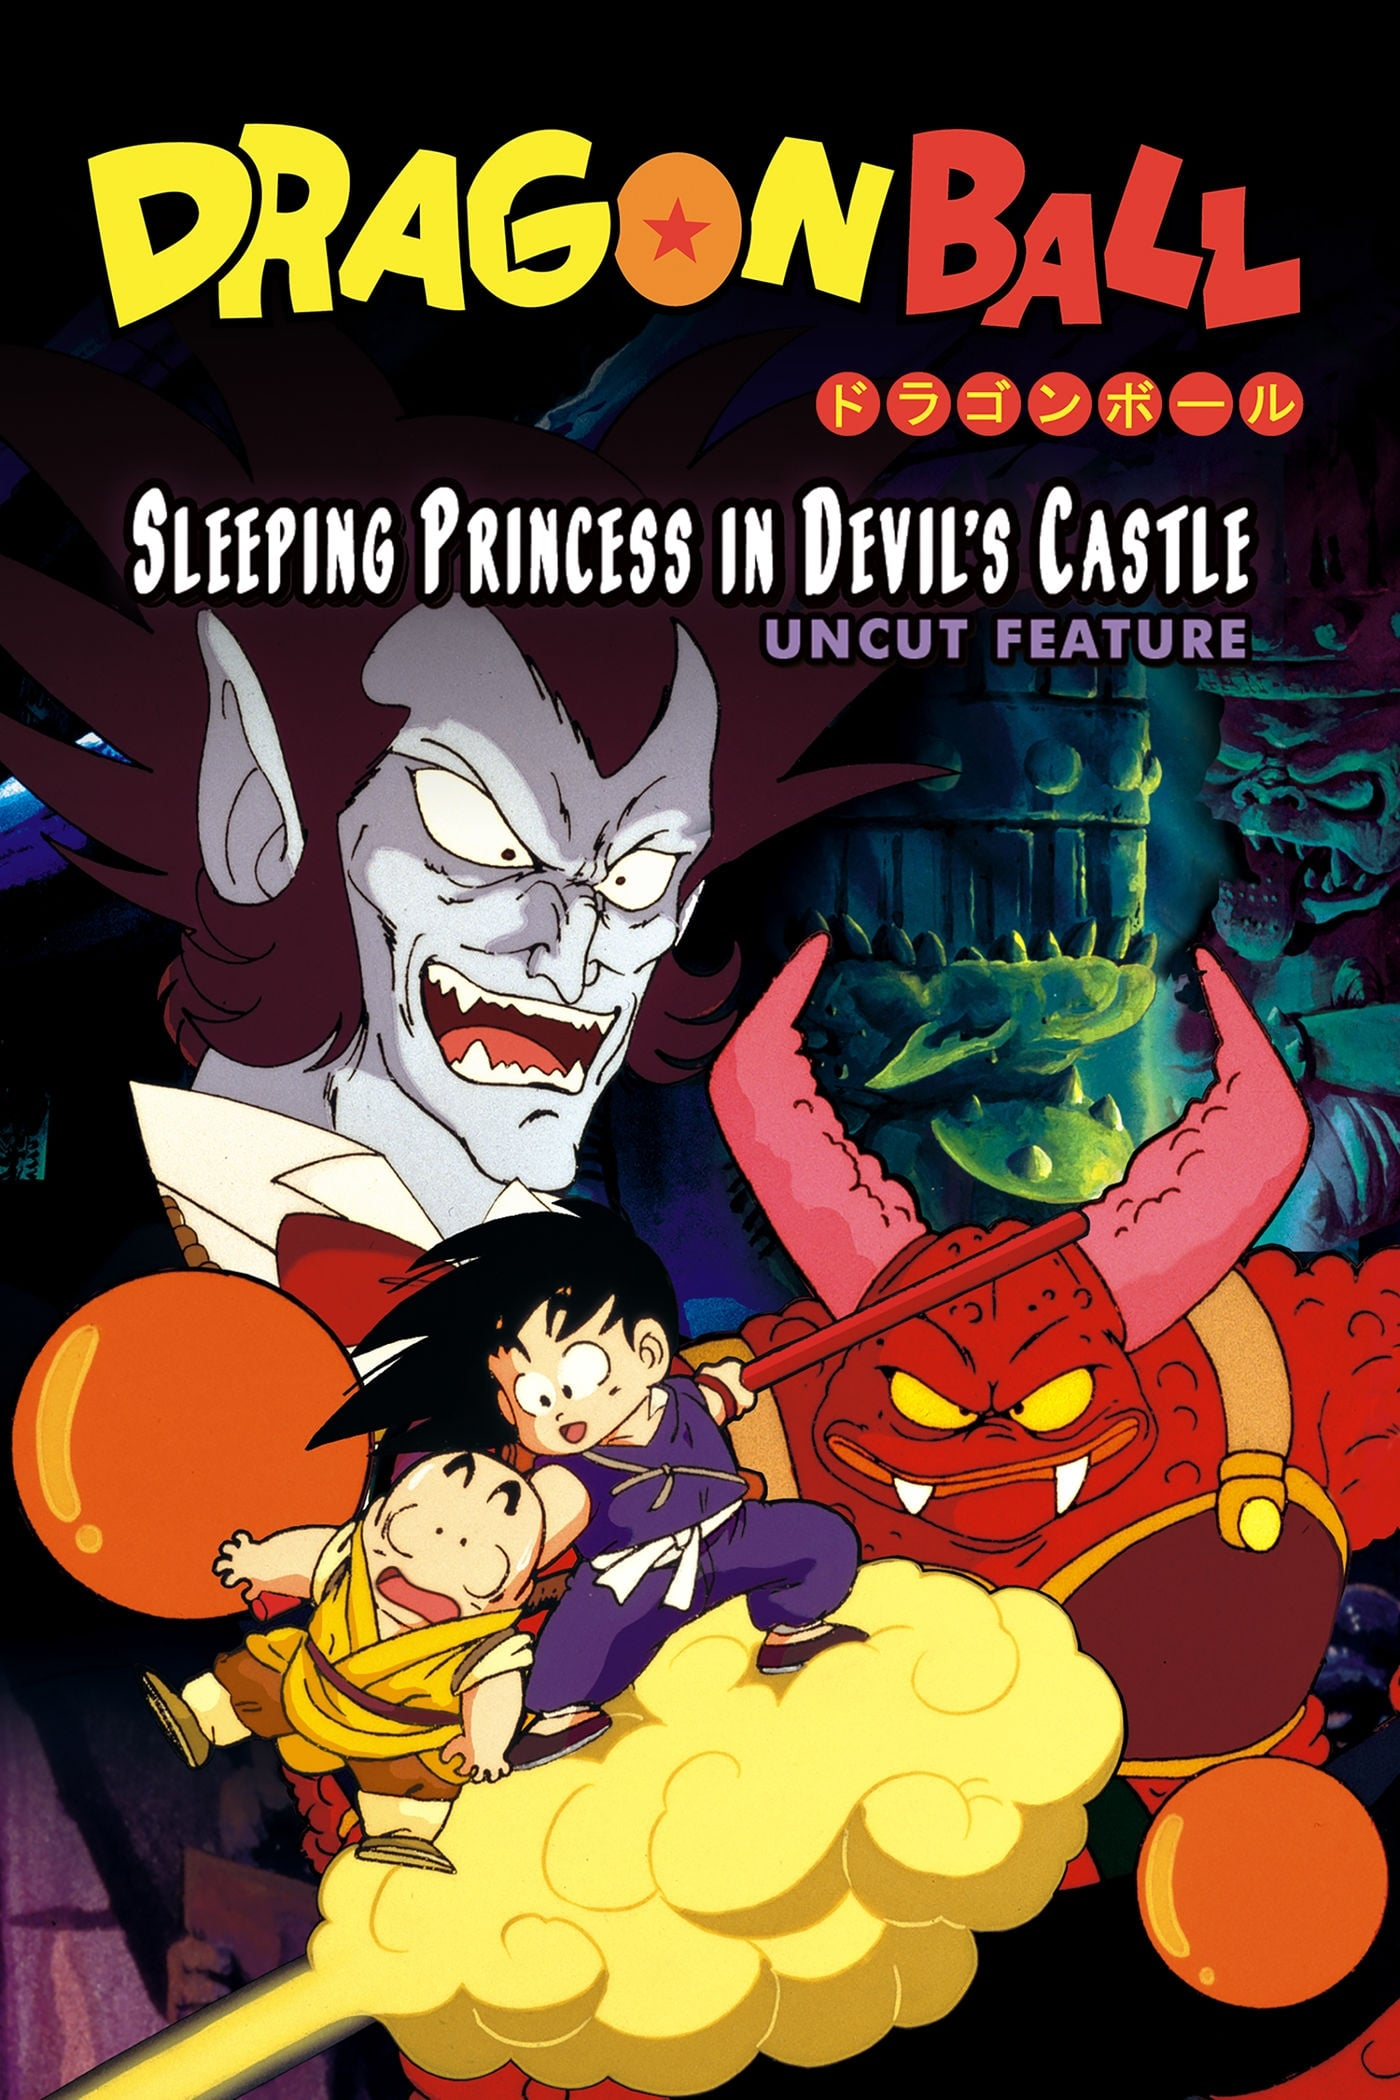 Dragon Ball: Sleeping Princess in Devil's Castle (1987)